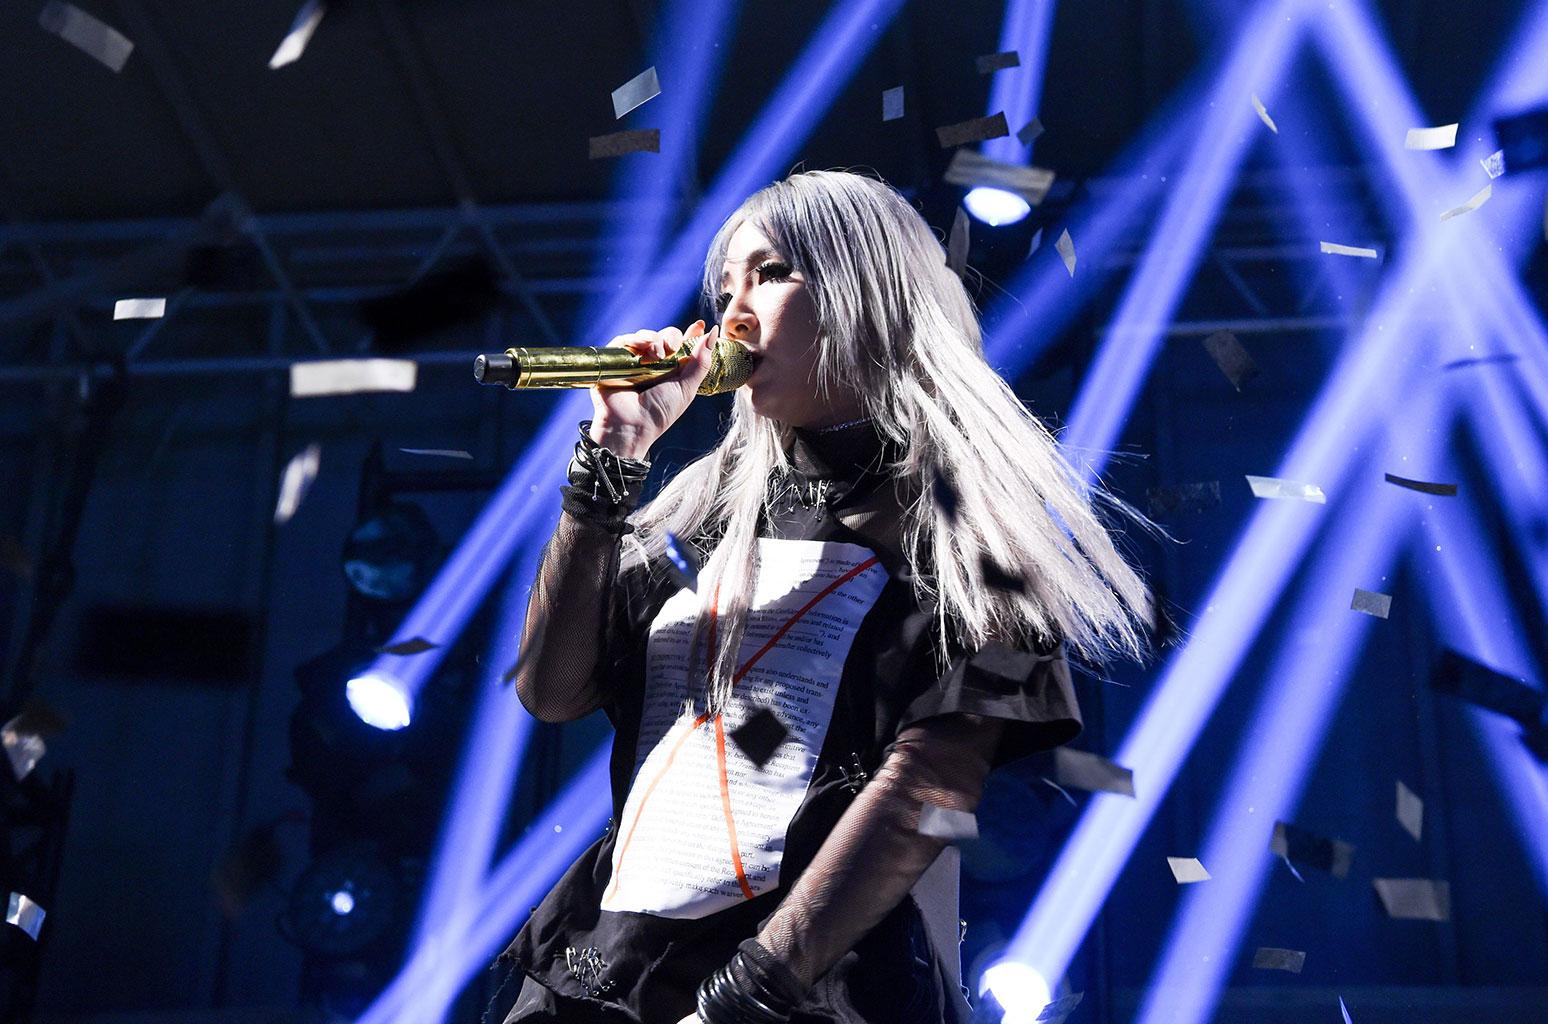 CL-New-York-Sept-perform-2016-billboard-1548.jpg